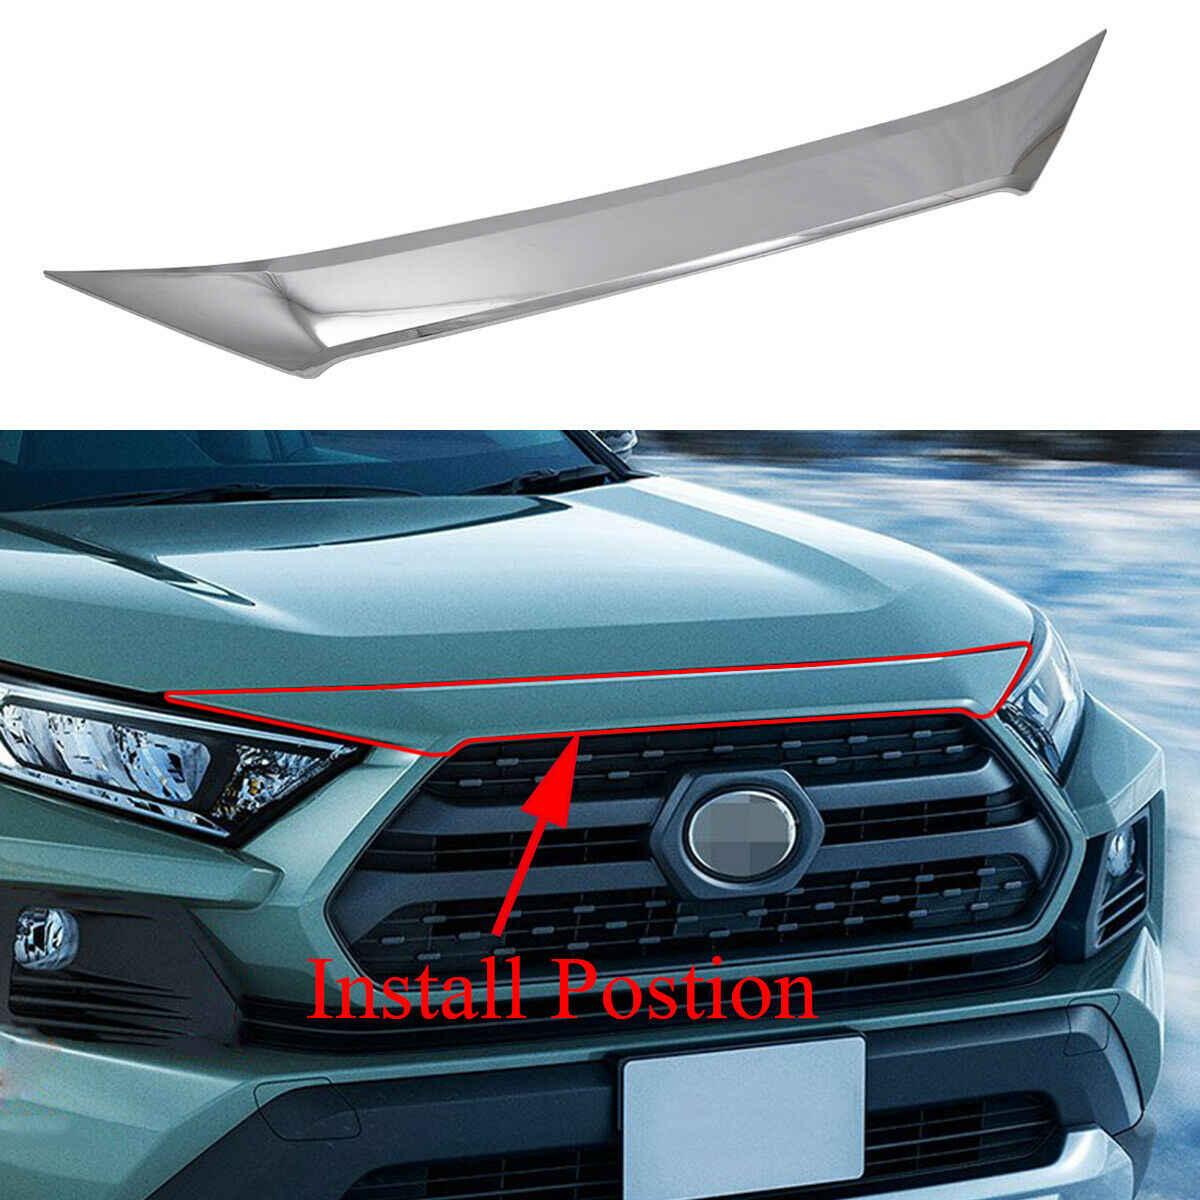 Car Accessories Air Vent Hood Intake Fender Cover Trim For Toyota Rav4 2019-2020